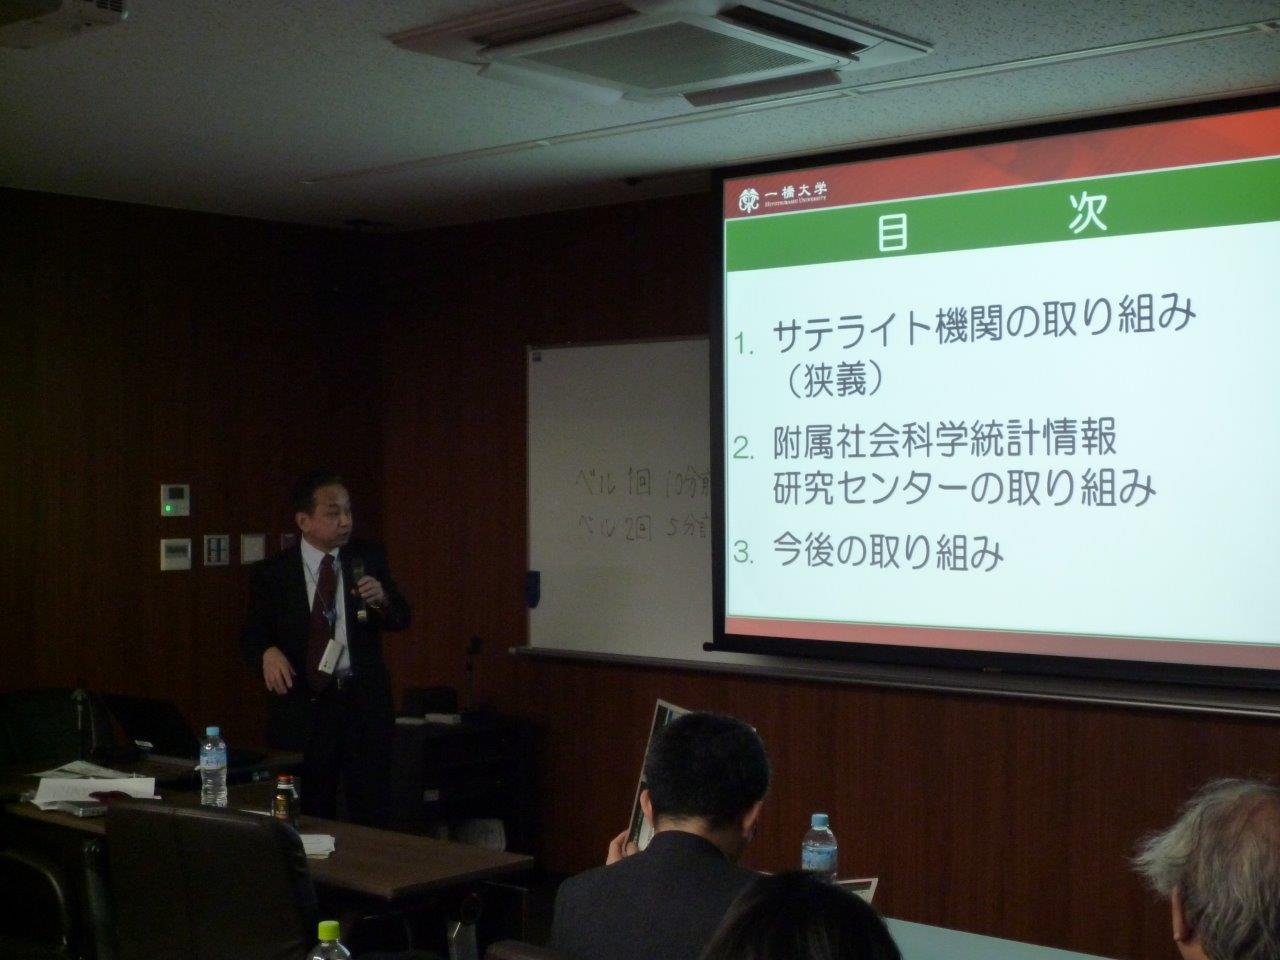 http://rcisss.ier.hit-u.ac.jp/Japanese/micro/information/P1040215.jpg